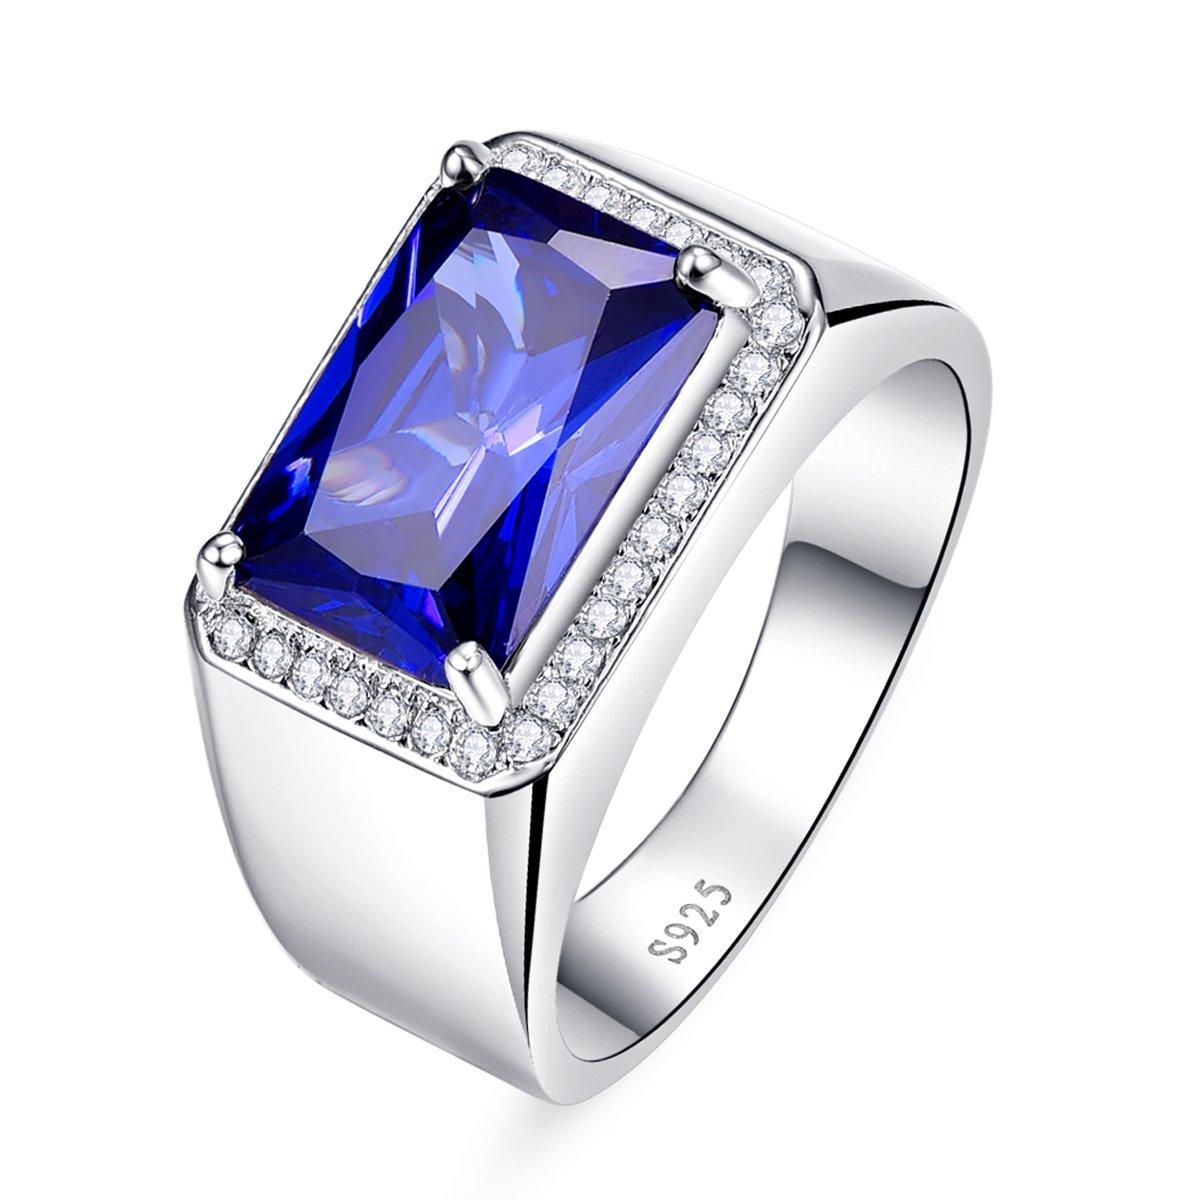 BONLAVIE 7.0ct Square Created Blue Sapphire 925 Sterling Silver Men's Ring Size 6